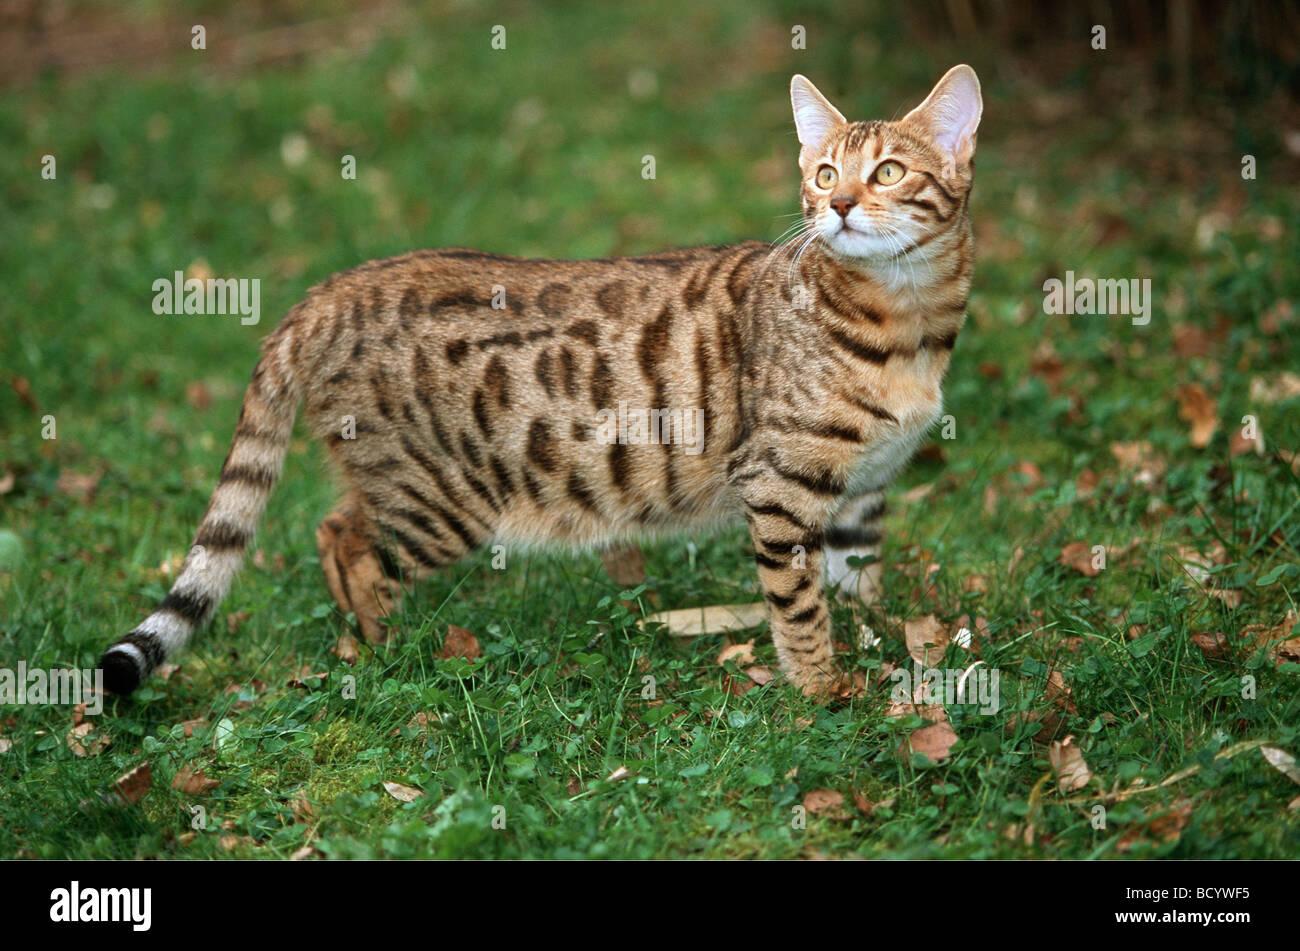 leopard cat felis bengalensis stockfotos leopard cat felis bengalensis bilder alamy. Black Bedroom Furniture Sets. Home Design Ideas